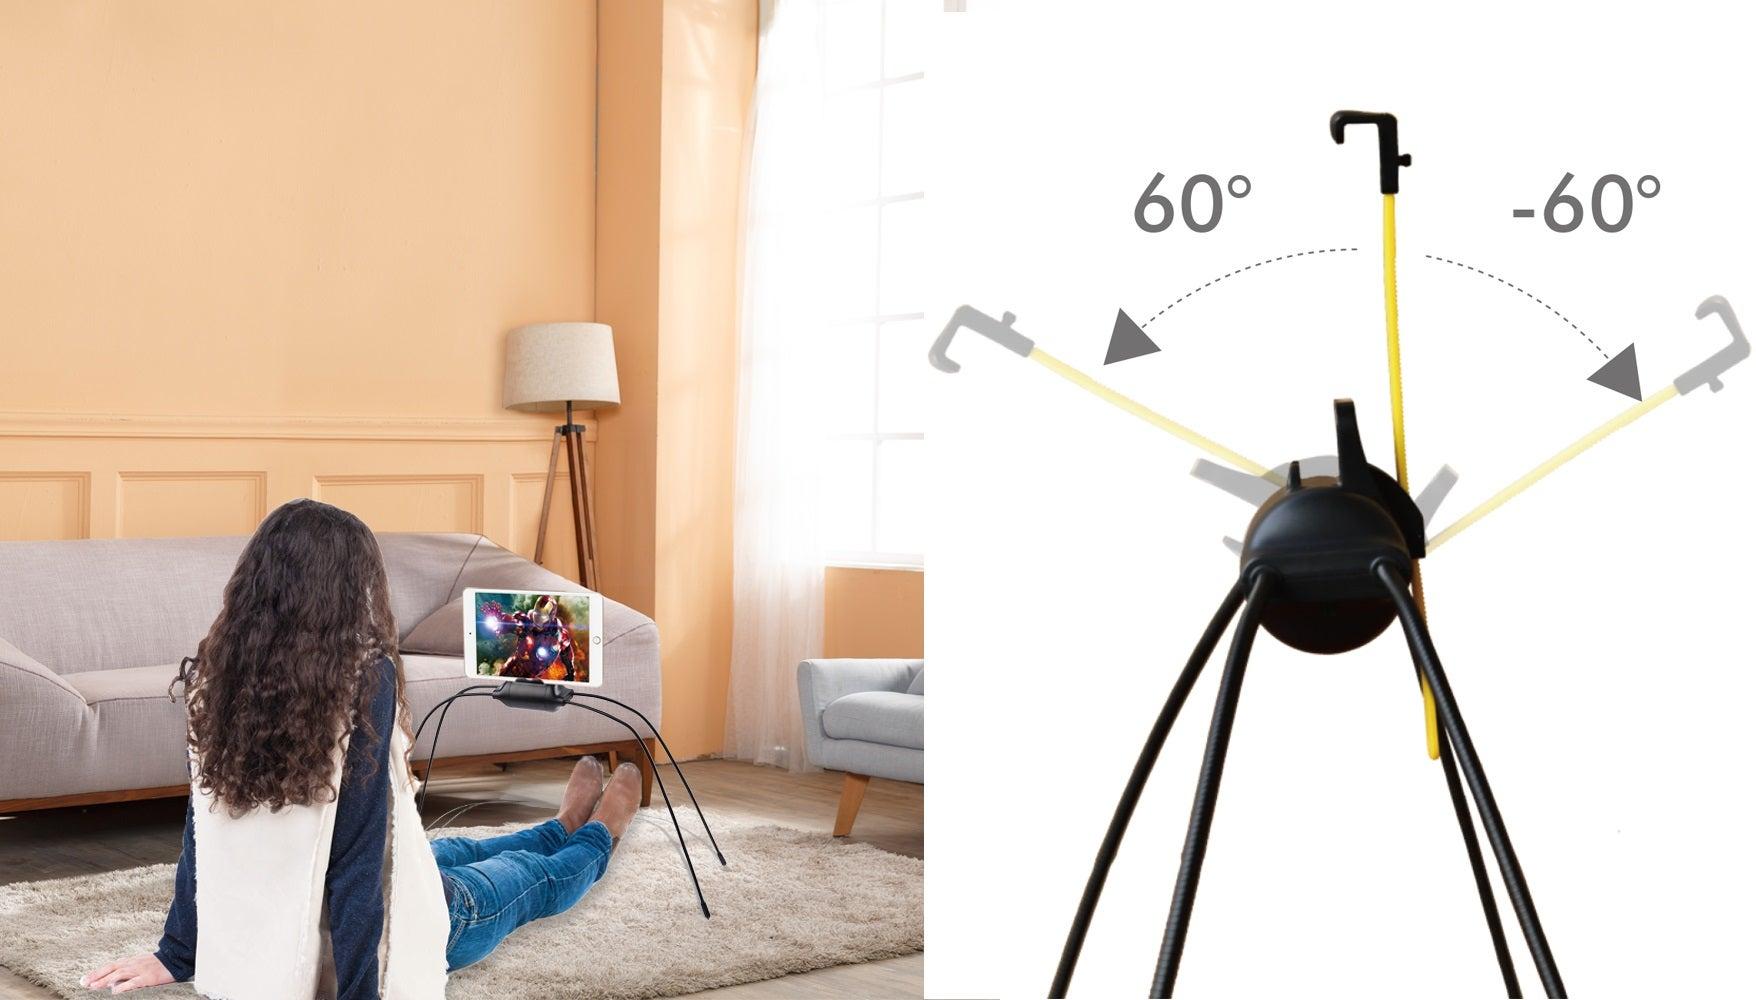 Universal Spider Tablet Cellphone Holder